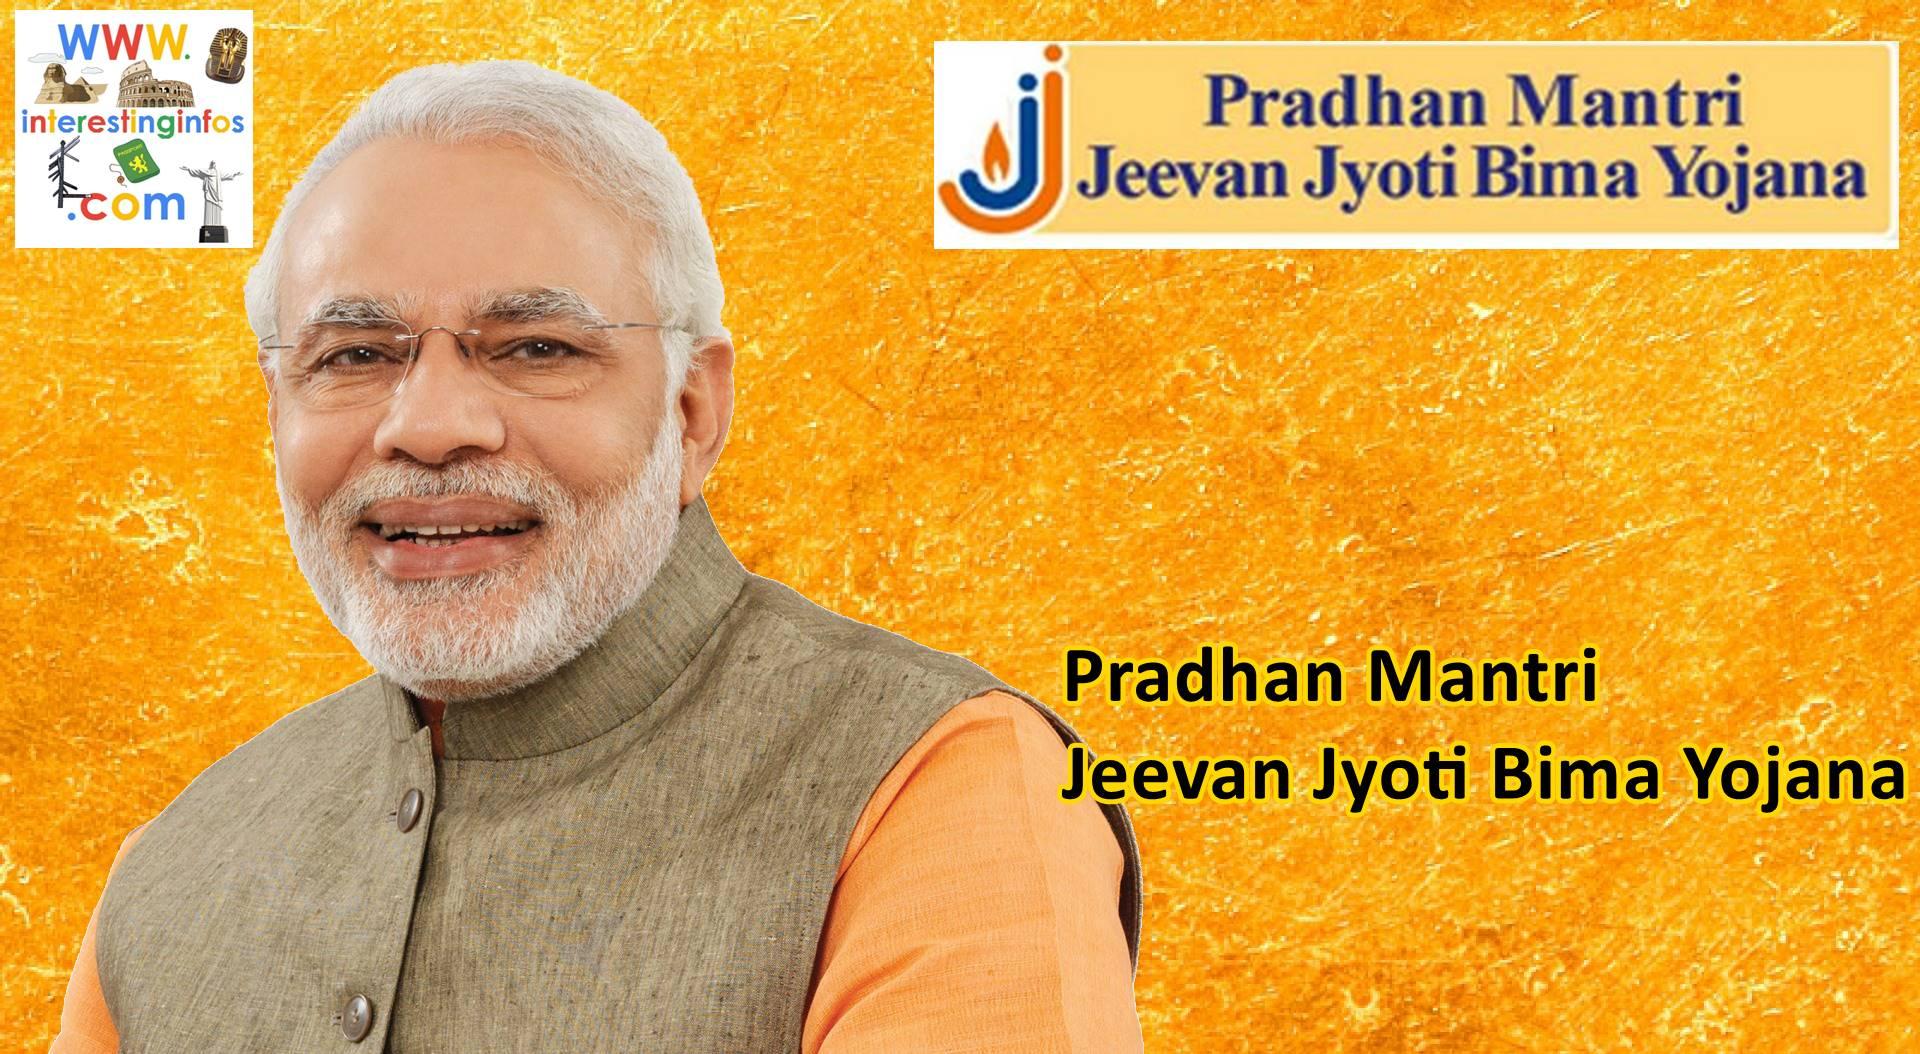 Narendra modi pradhan mantri jeevan jyoti bima yojana